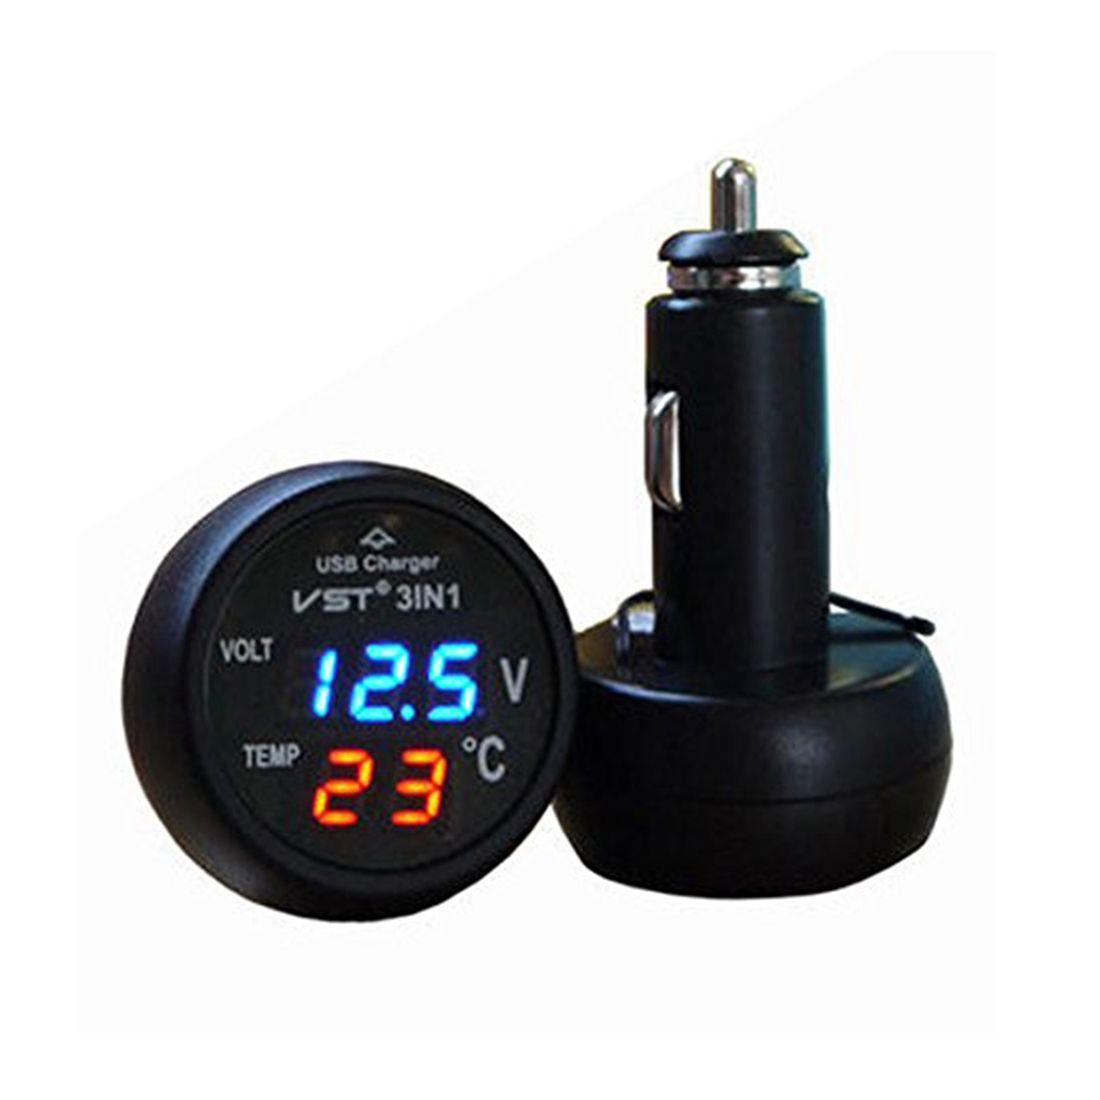 Multifunction Car Digital Voltmeter USB Car Charger 3 in 1 LED Battery DC Voltmeter Thermometer Temperature Sensor